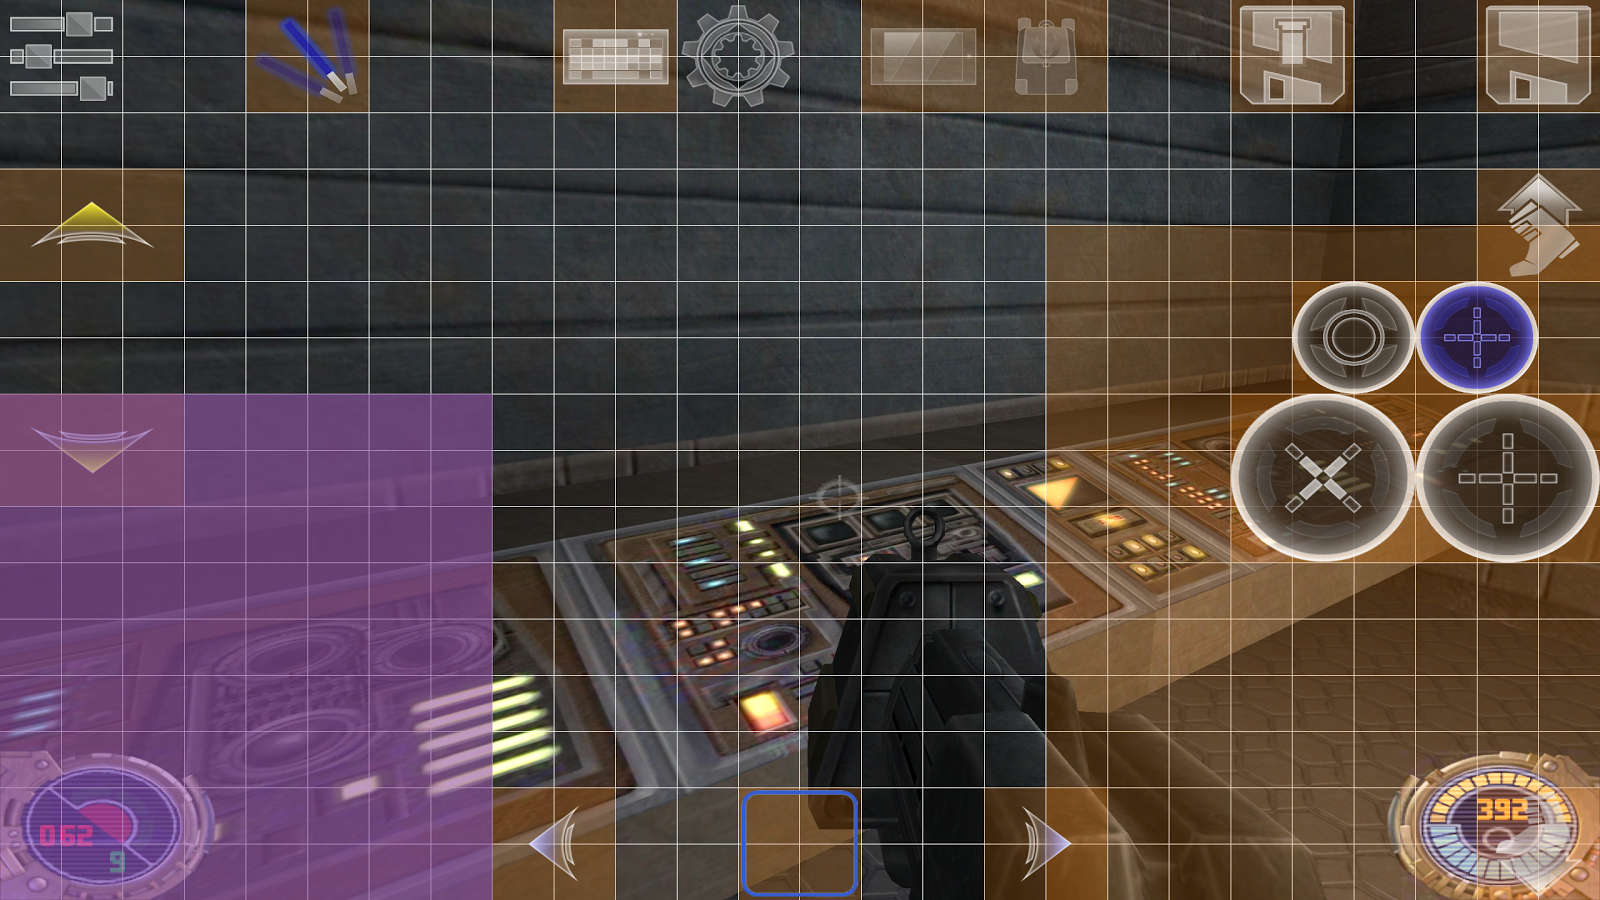 JK2-Touch (Jedi Outcast port) - screenshot